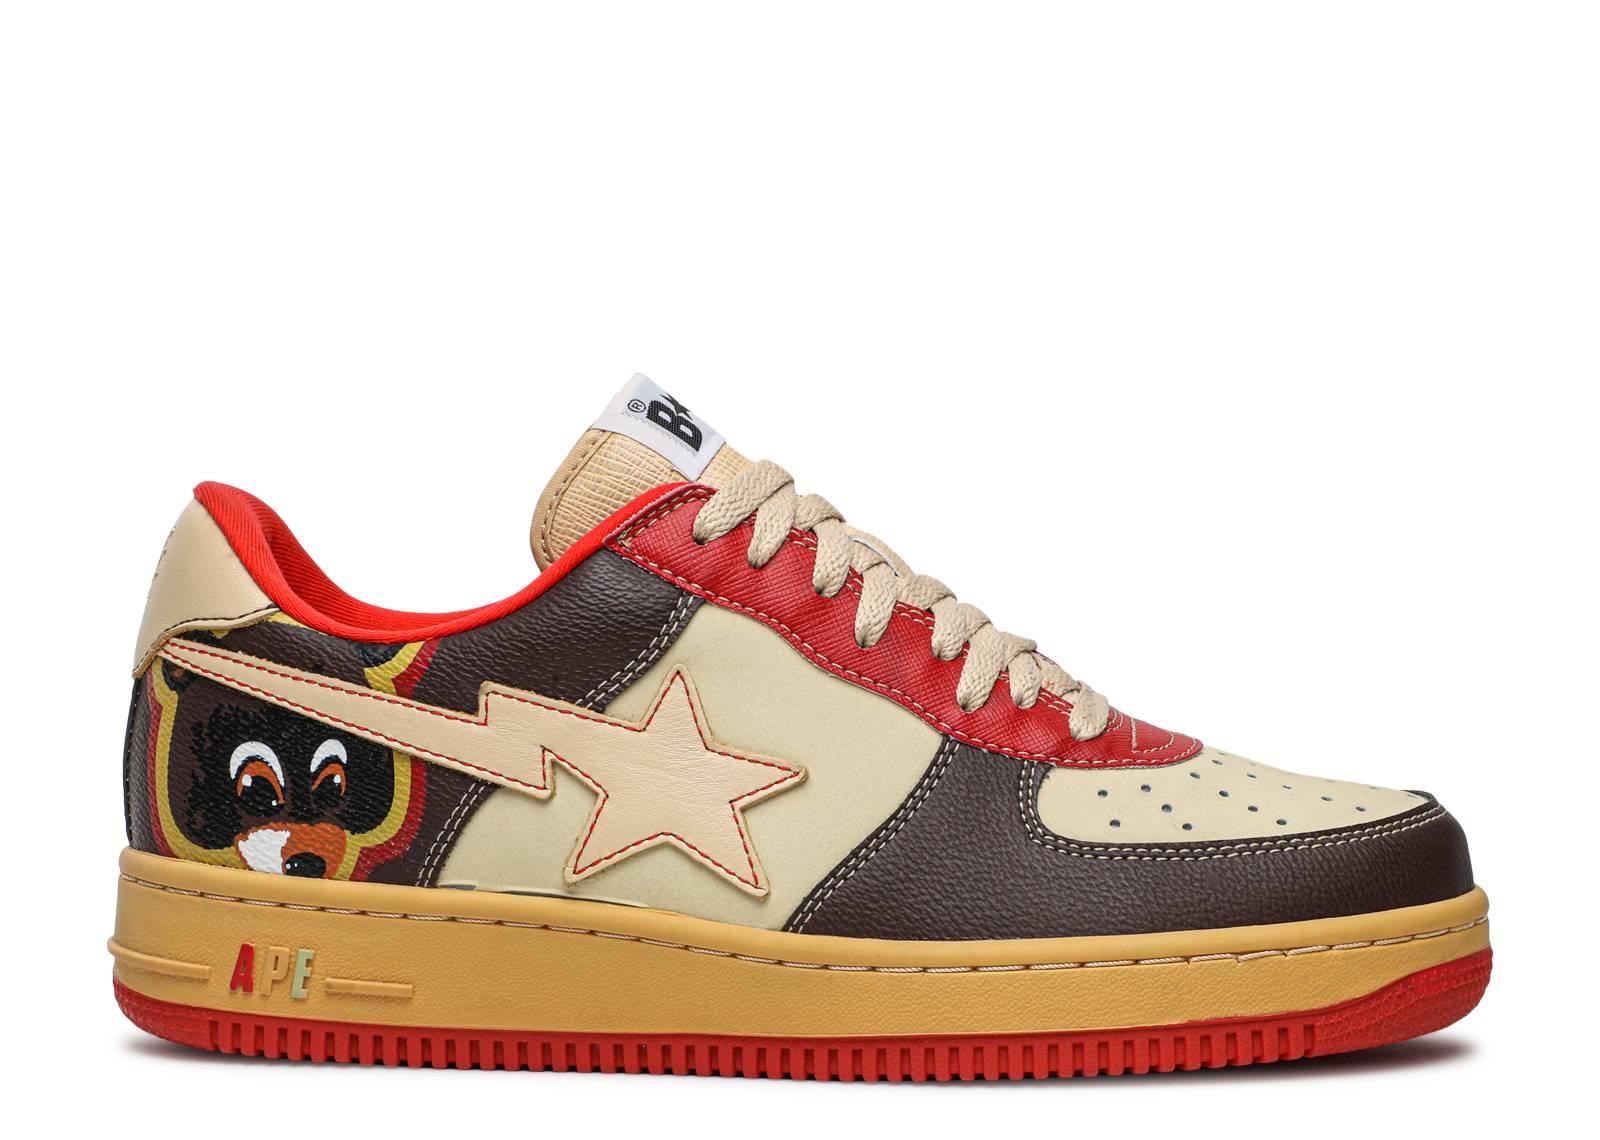 Kanye West Bape Shoes Price